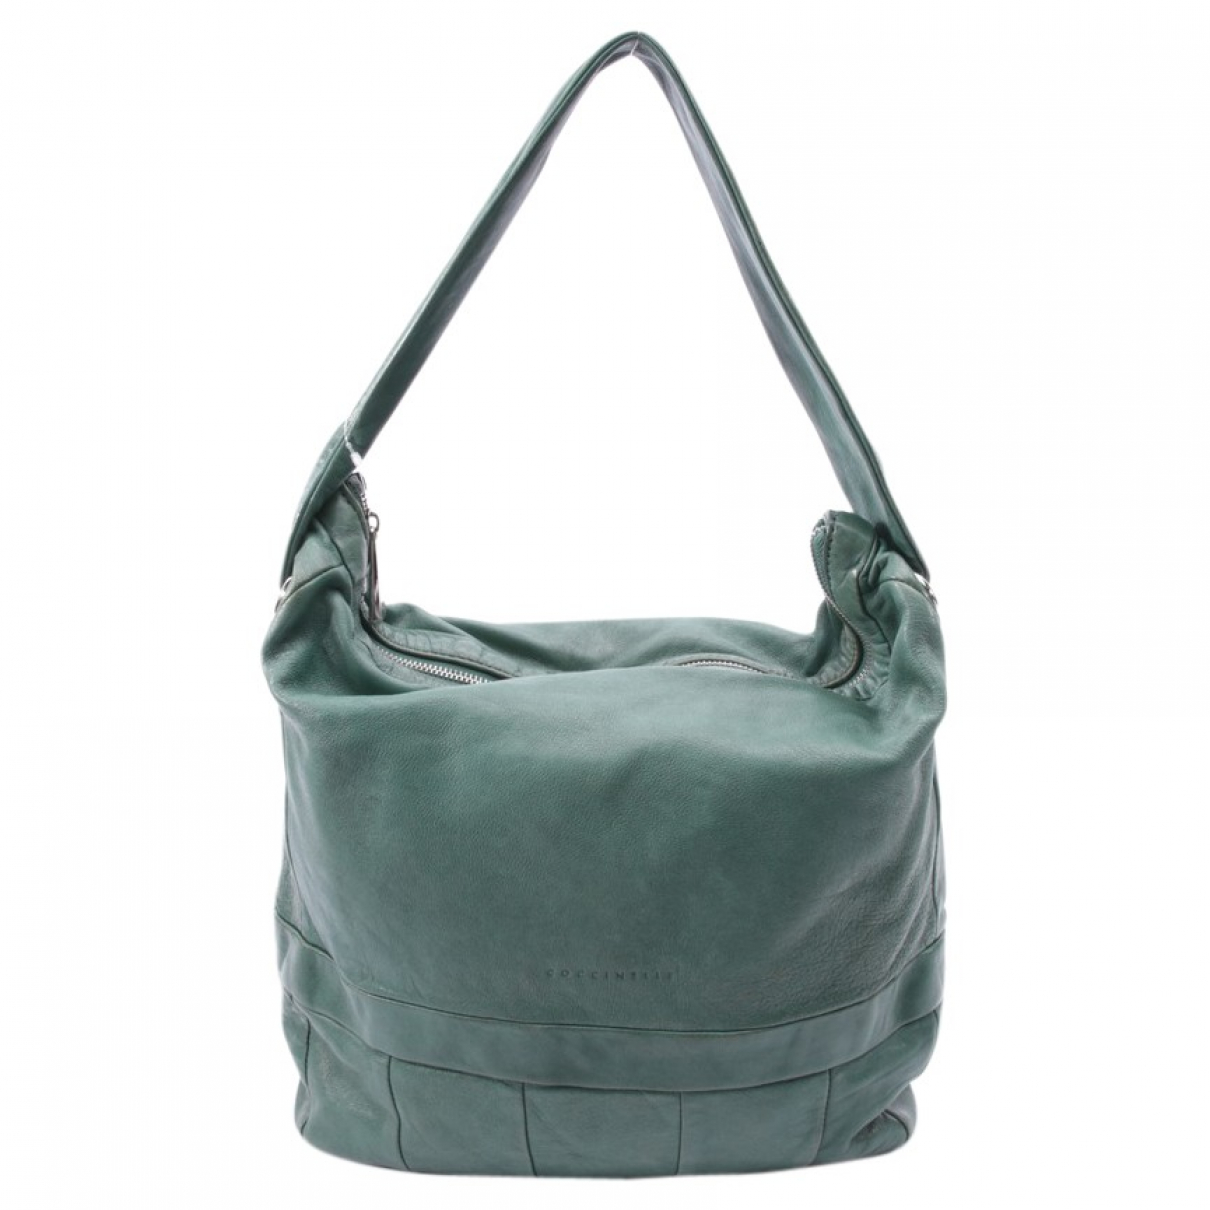 Coccinelle \N Green Leather handbag for Women \N